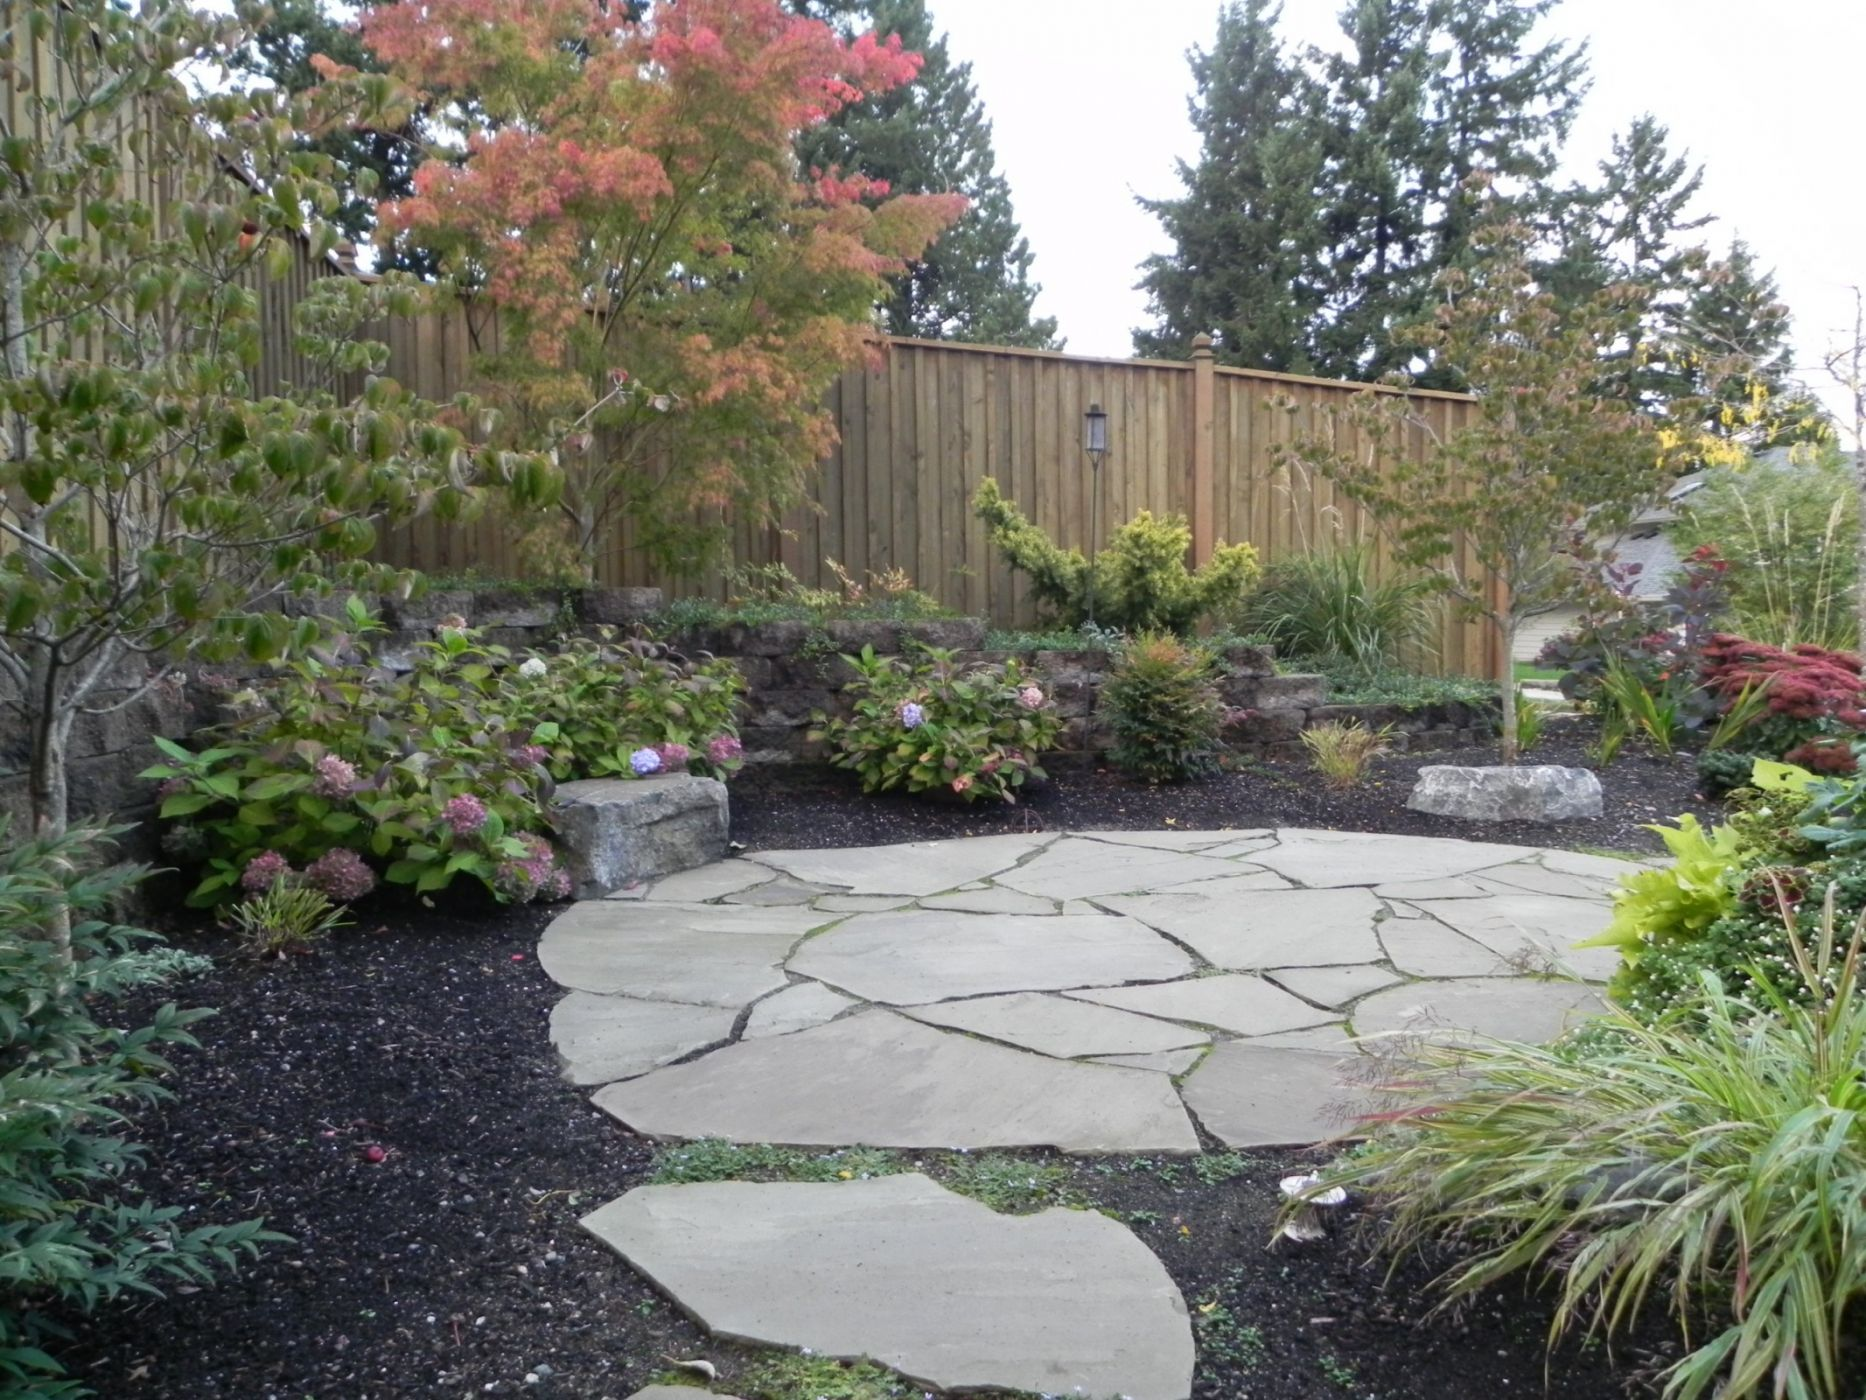 Backyard patio ideas flagstone - Flagstone Patio Pictures Designs Innovative Flagstone Patio Designs 88 Outdoor Patio Design Ideas Brick Flagstone Covered